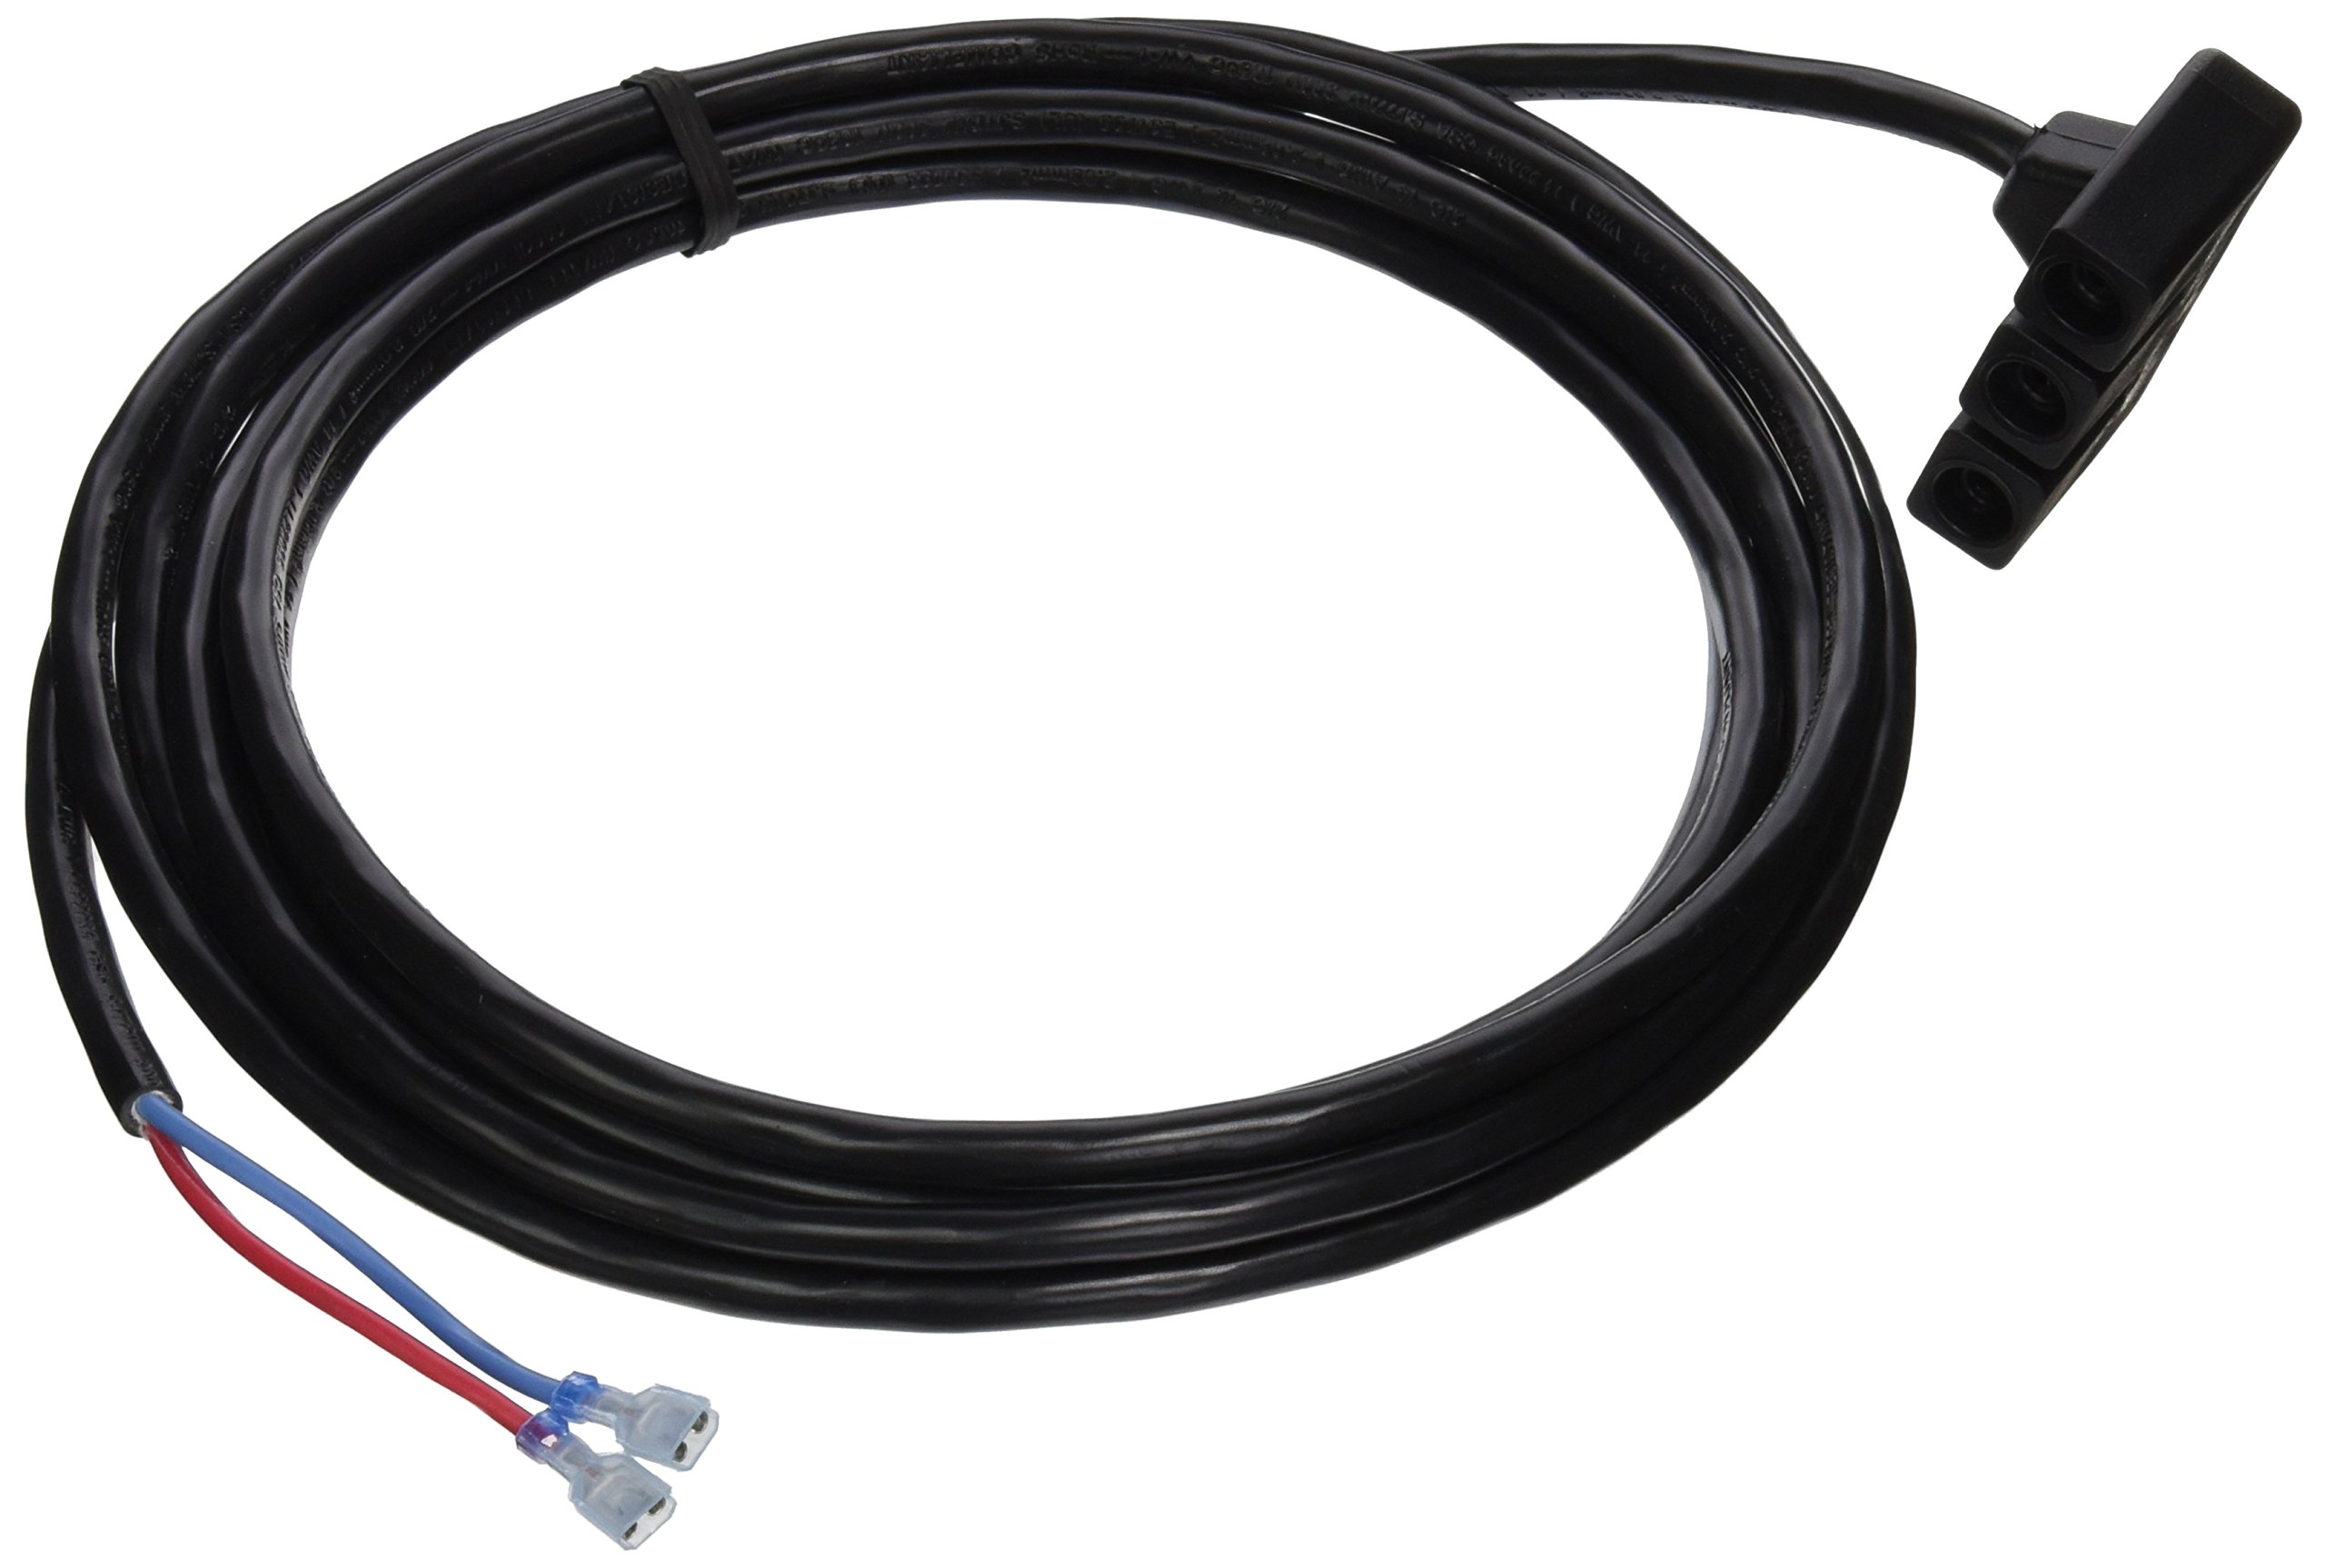 Zodiac R0402800 16-Feet DC Power Cord Replacement for Zodiac AquaPure Electronic Salt Water Chlorine Generator